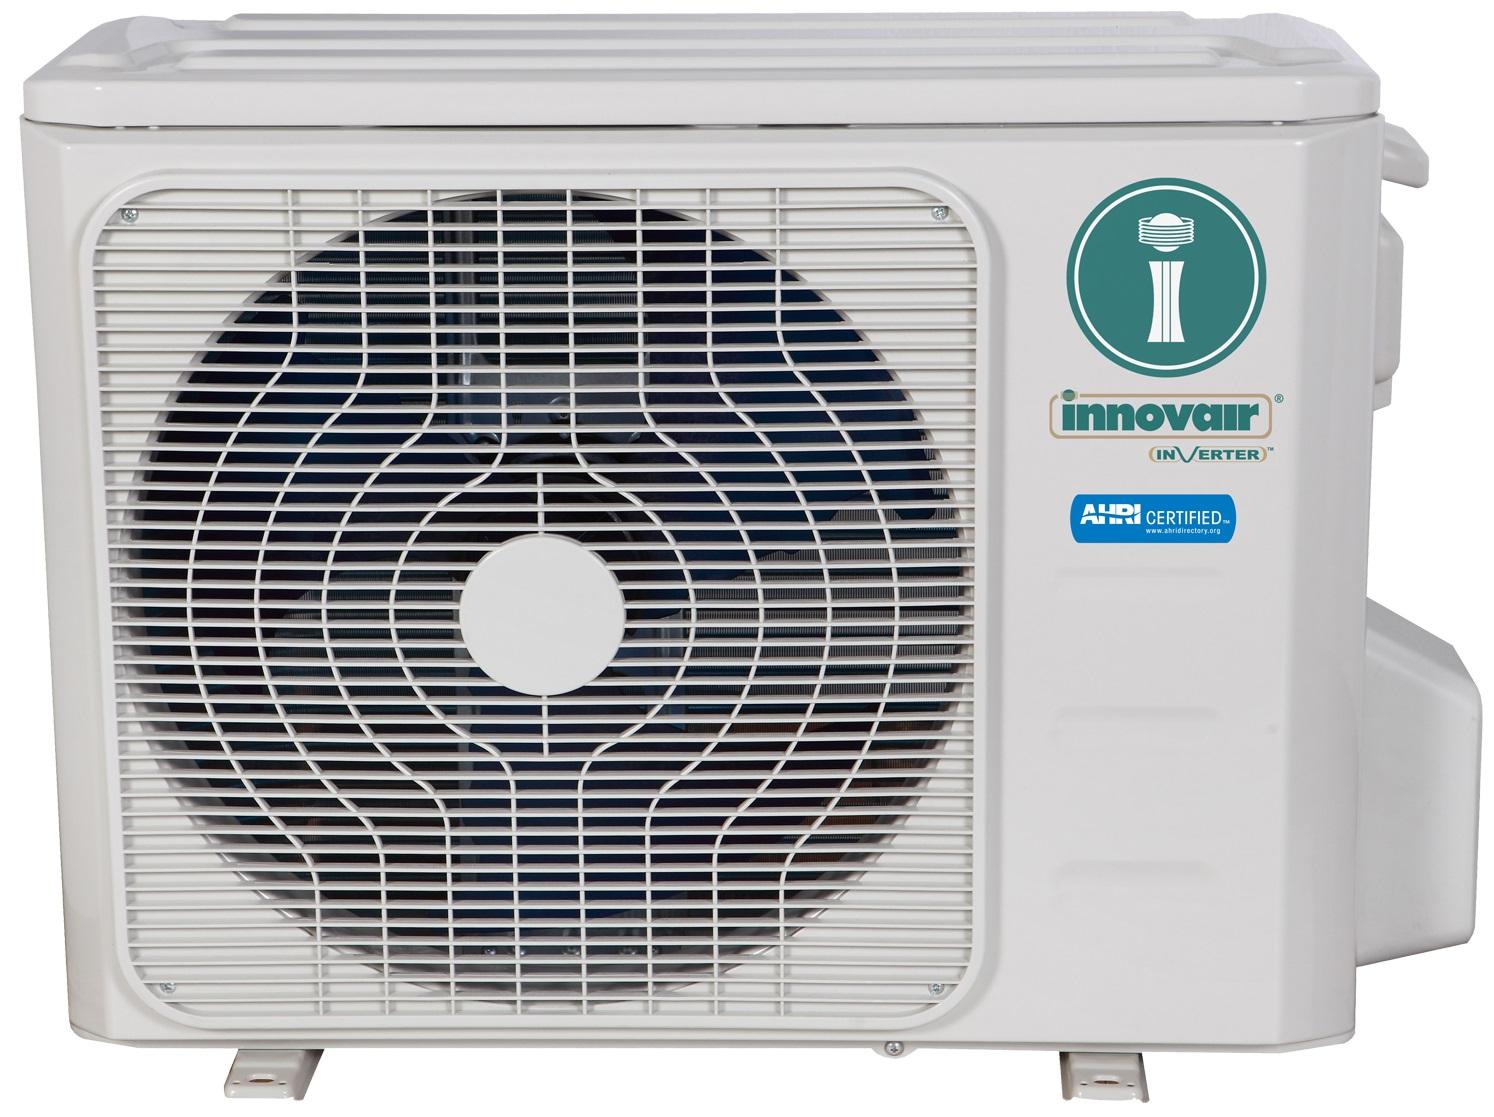 Innovair 18000 Btu 17 6 SEER Mini Split Heat Pump Air Conditioner